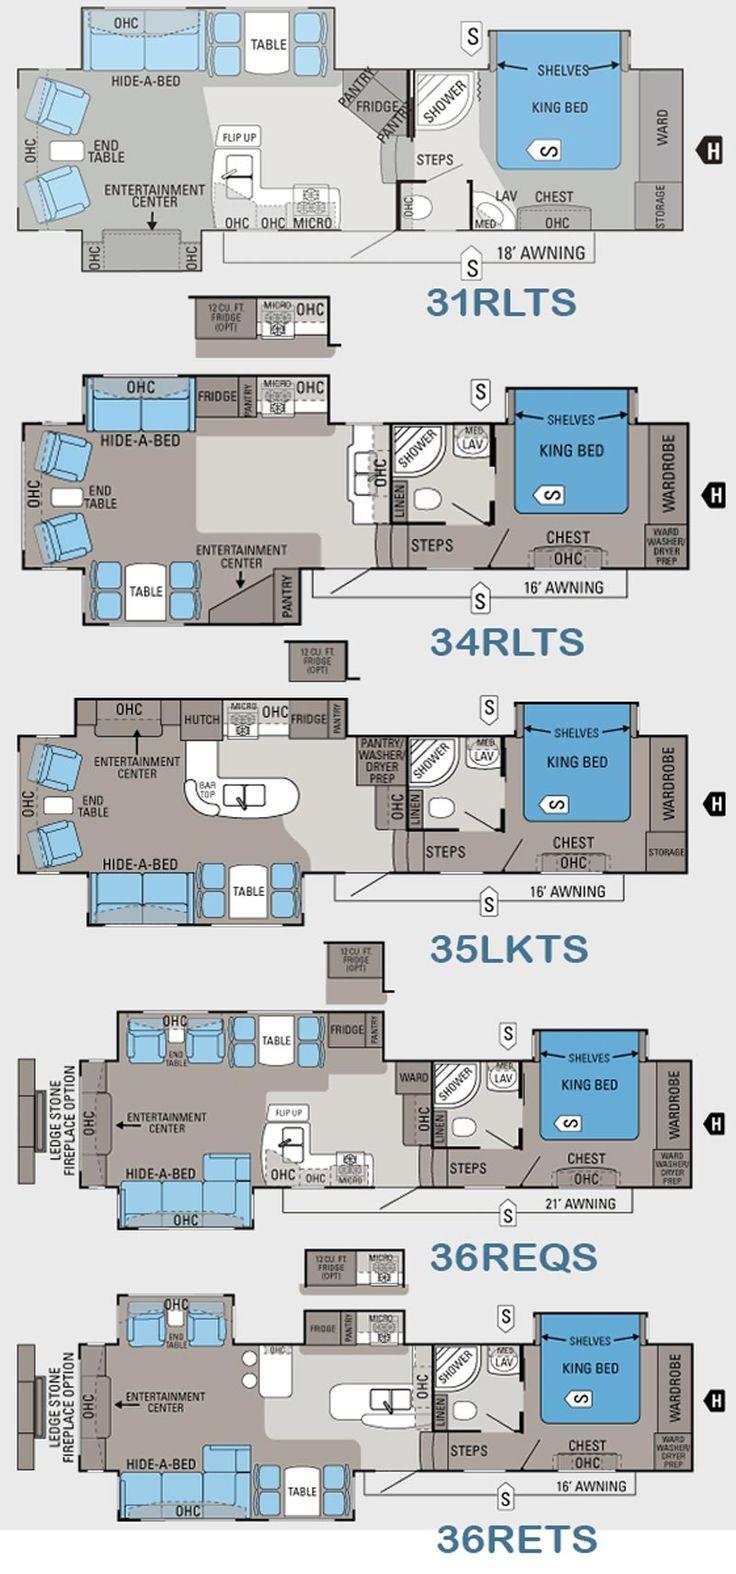 Jayco Travel Trailer Floor Plans Part - 40: Continental Coach 43u0027 Double Bedroom Floorplans | RVu0027s With Bunk House |  Pinterest | Double Bedroom, Camper Flooring And Rv